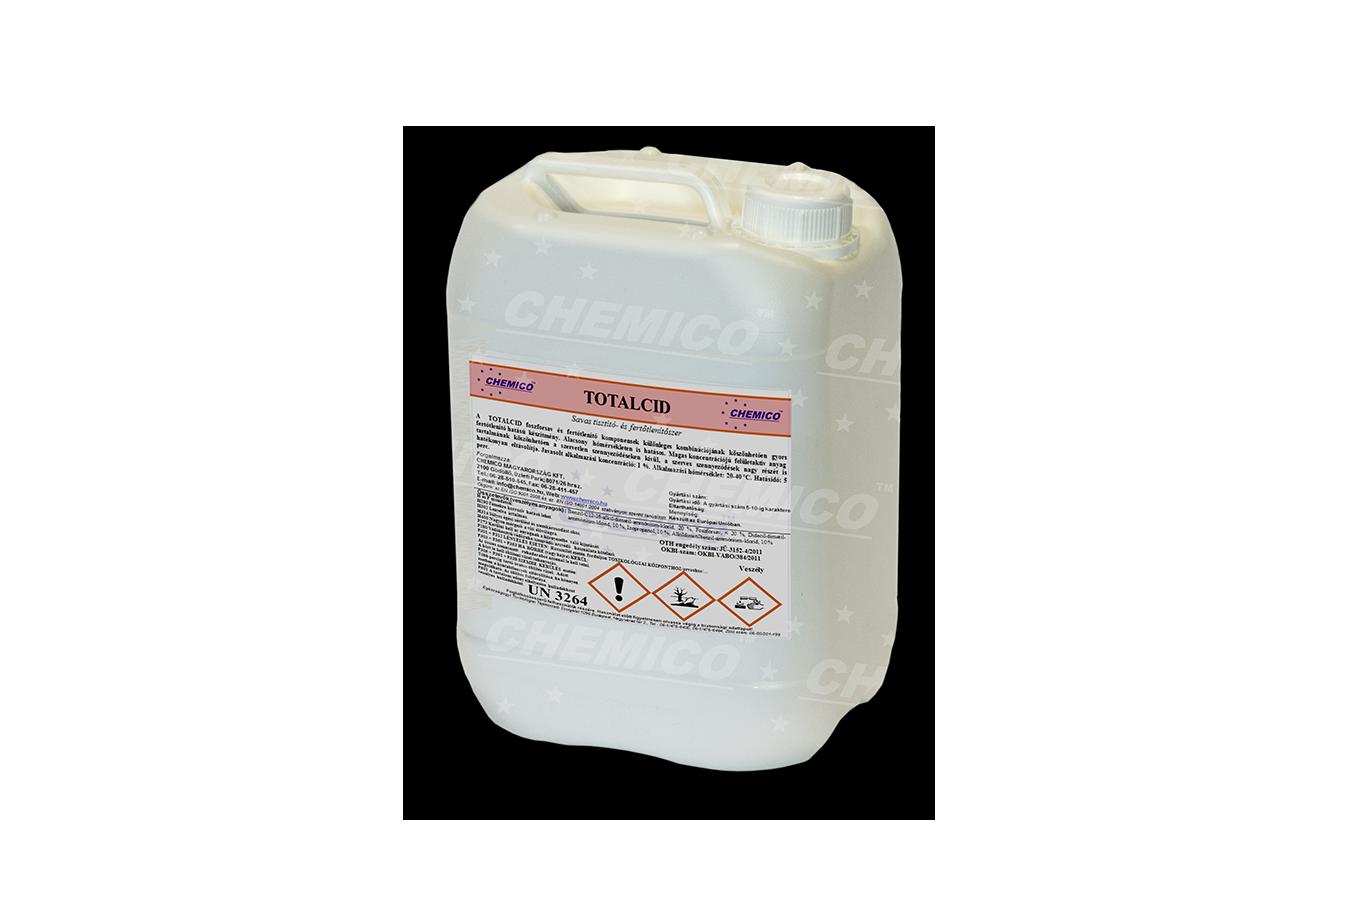 totalcid-vizkooldo-fertotlenito-savas-ipari-chemico-5l